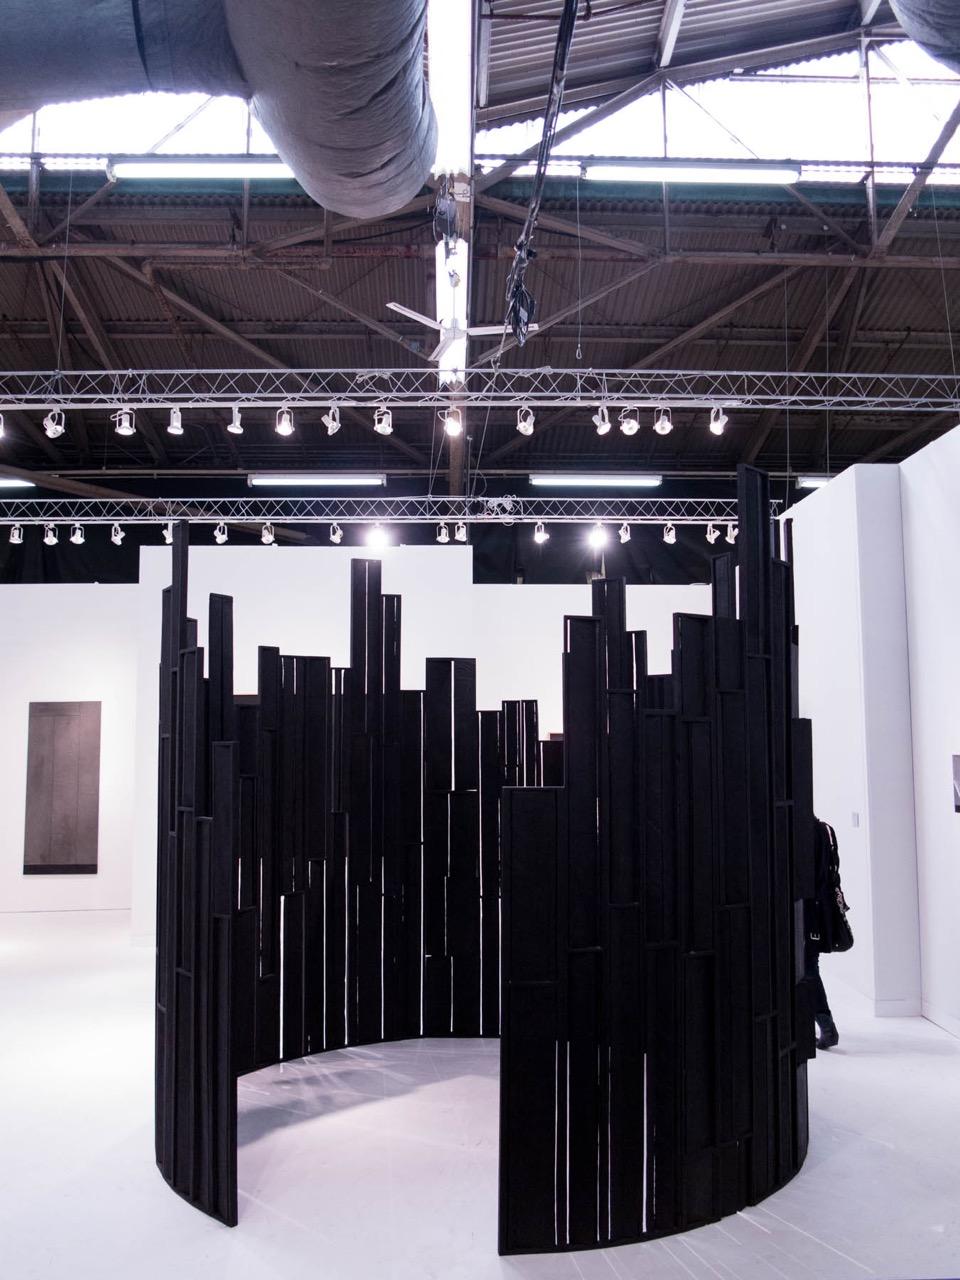 Armory Art show 2016 AM  - 1